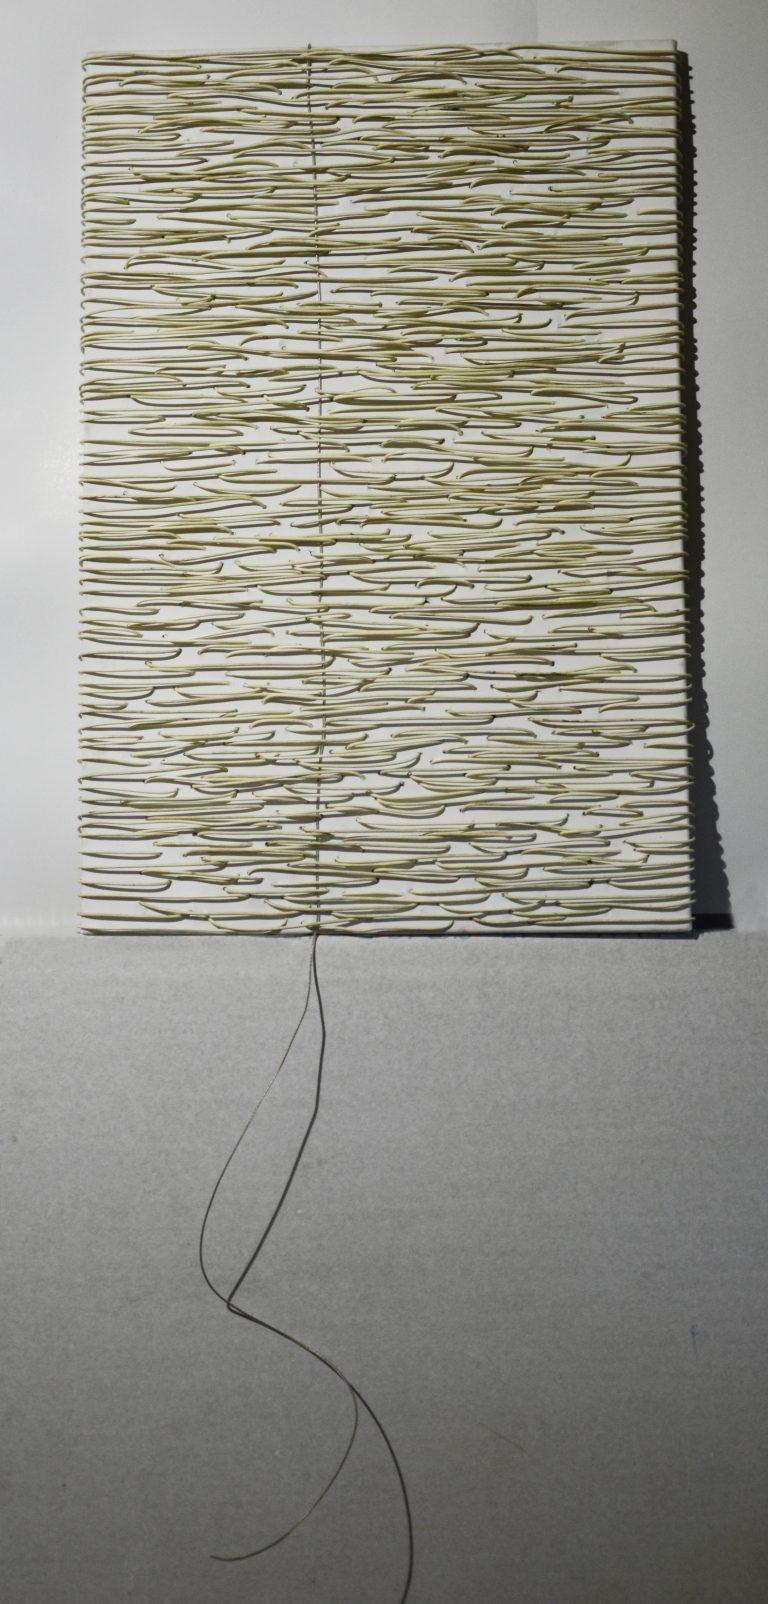 Silver line, 60 x 90cm